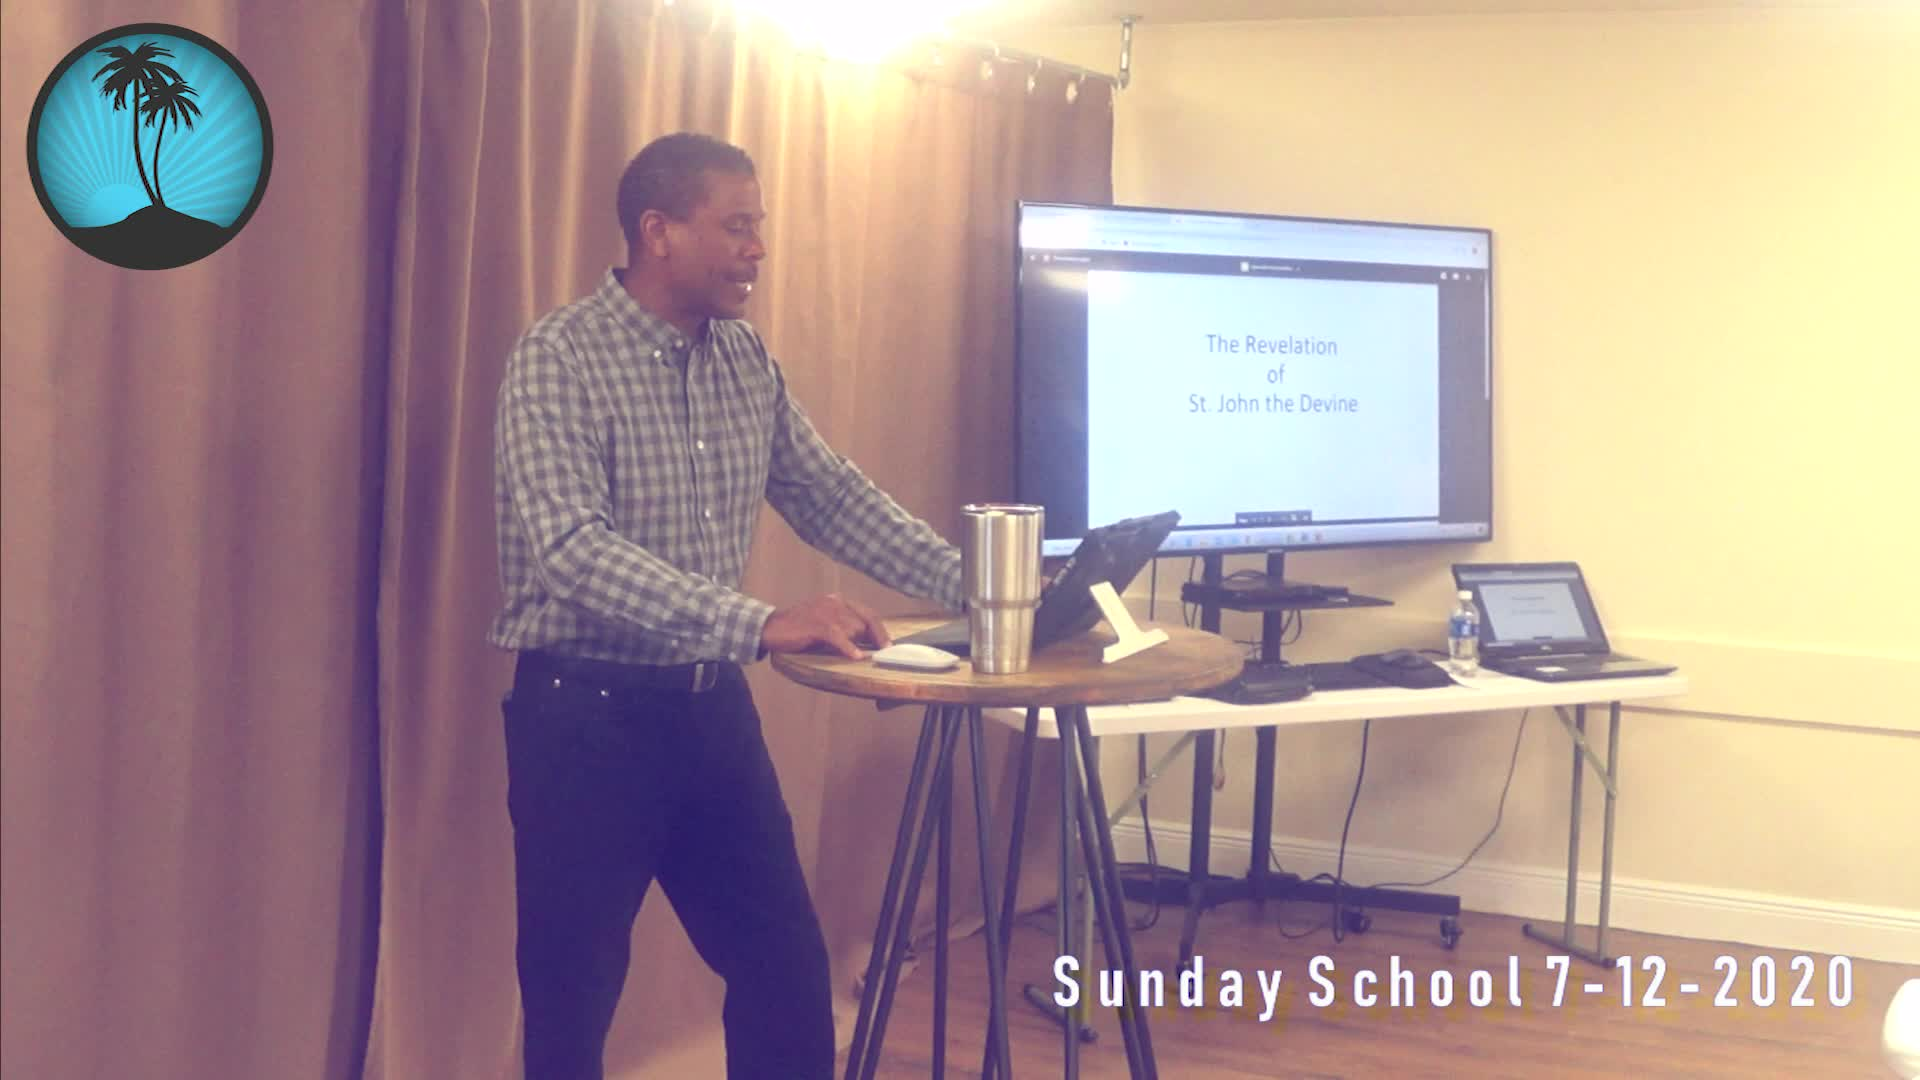 Sunday School 2nd Service 7-12-2020